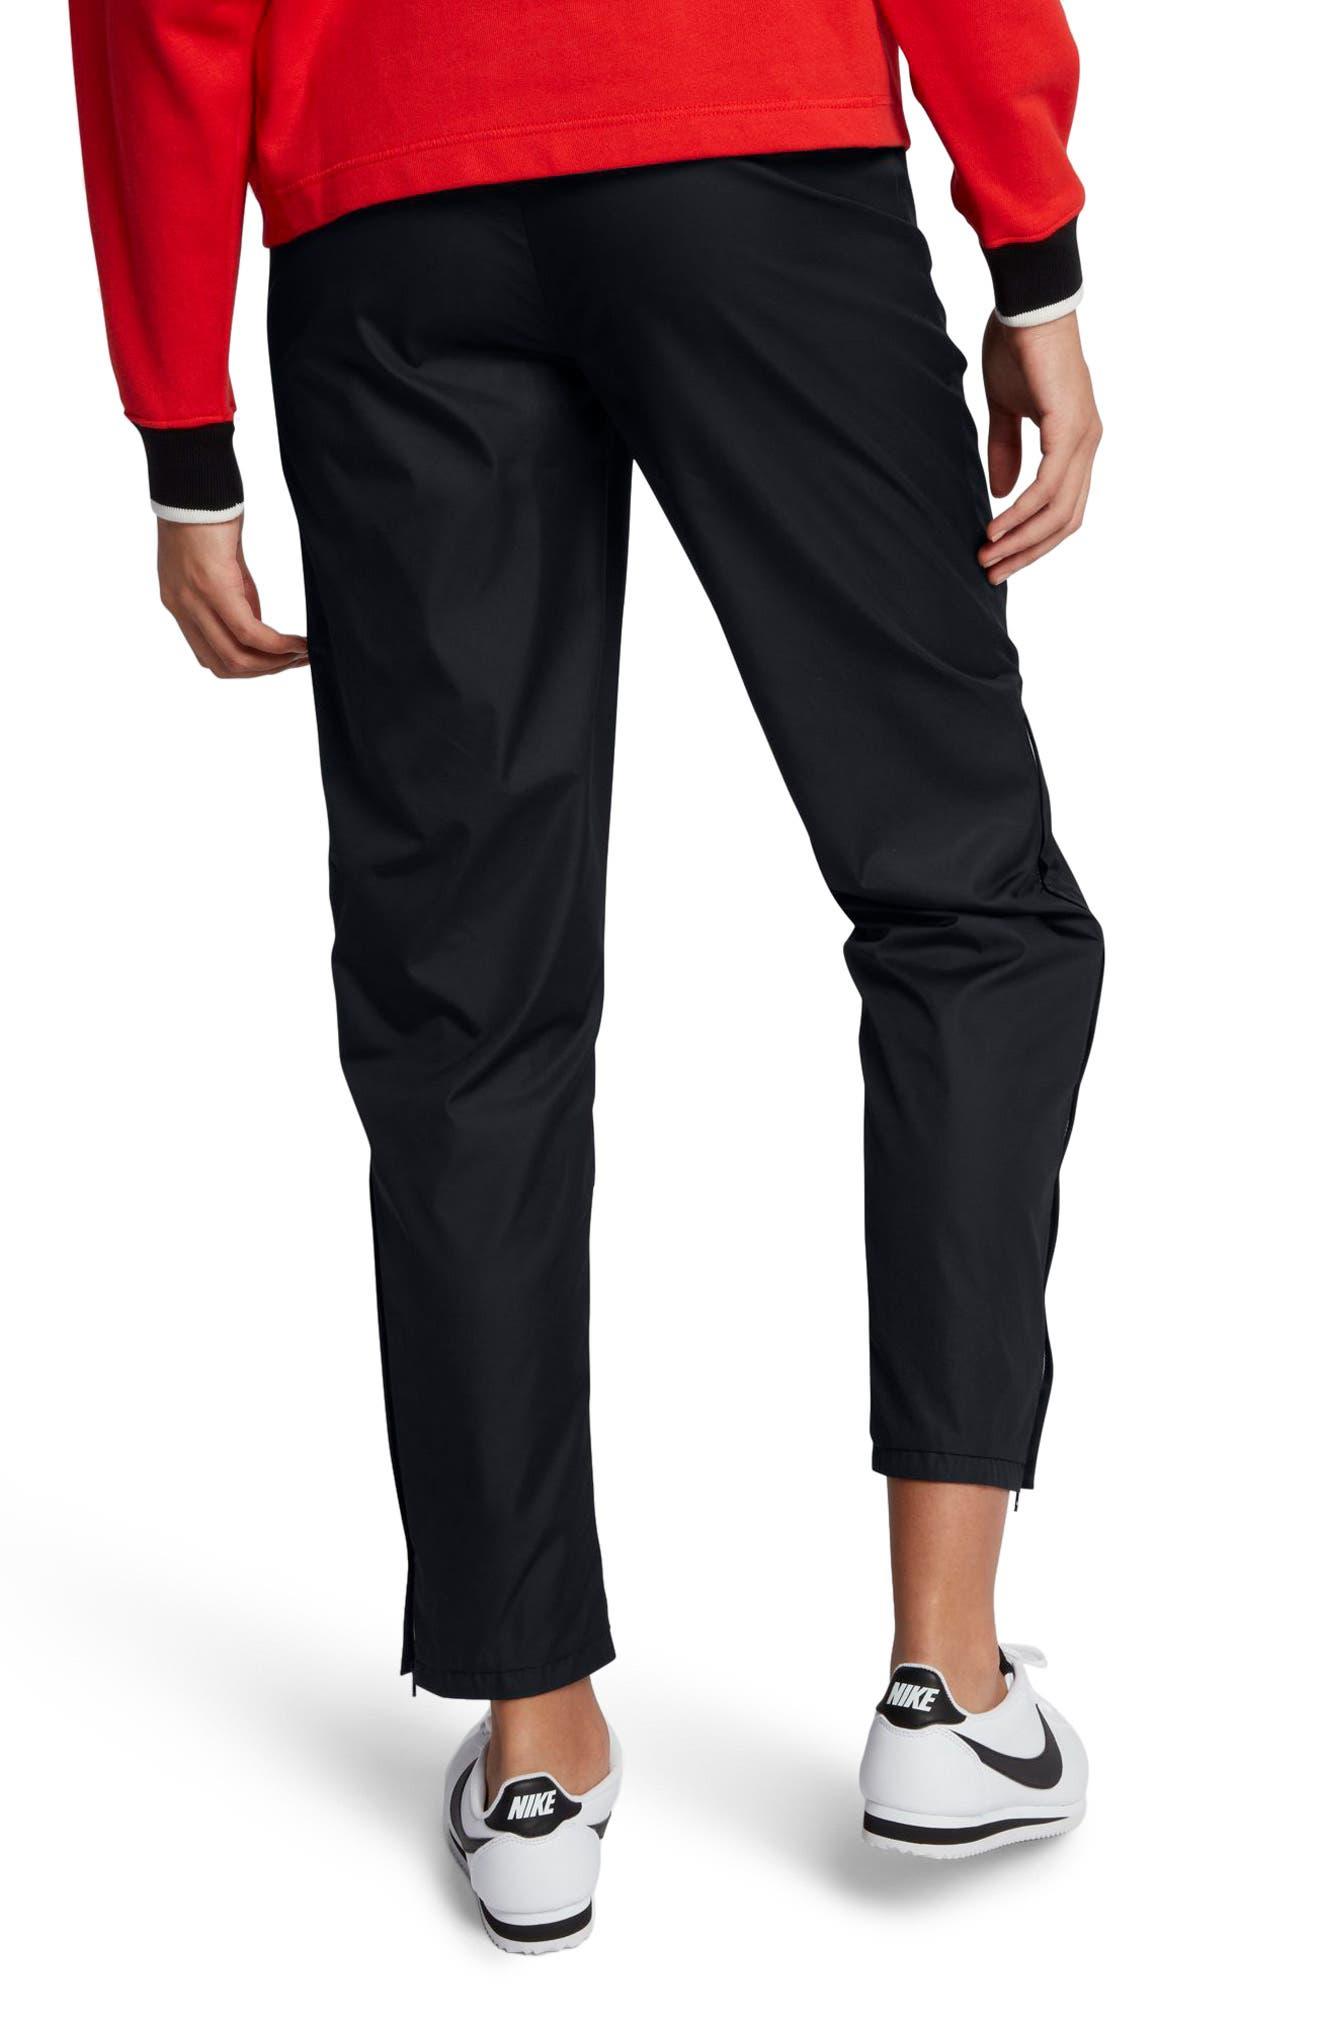 Sportswear Women's Stretch Faille Pants,                             Alternate thumbnail 3, color,                             Black